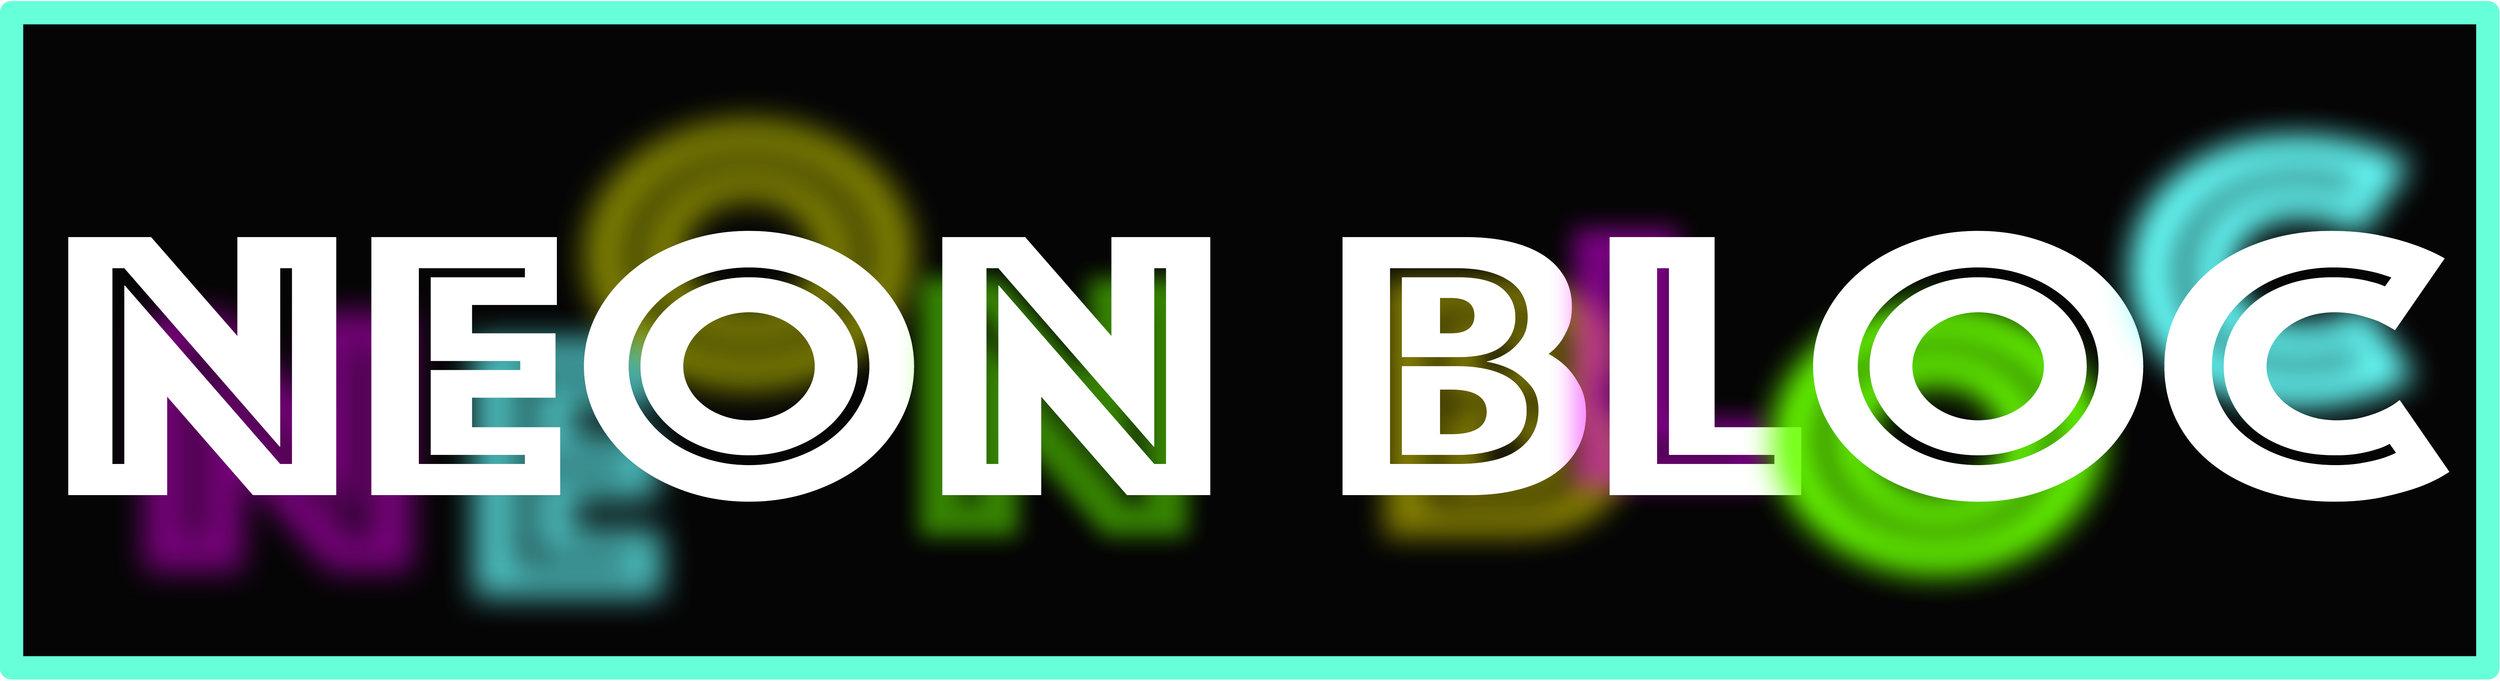 NEON BLOC Bumper Sticker.jpg